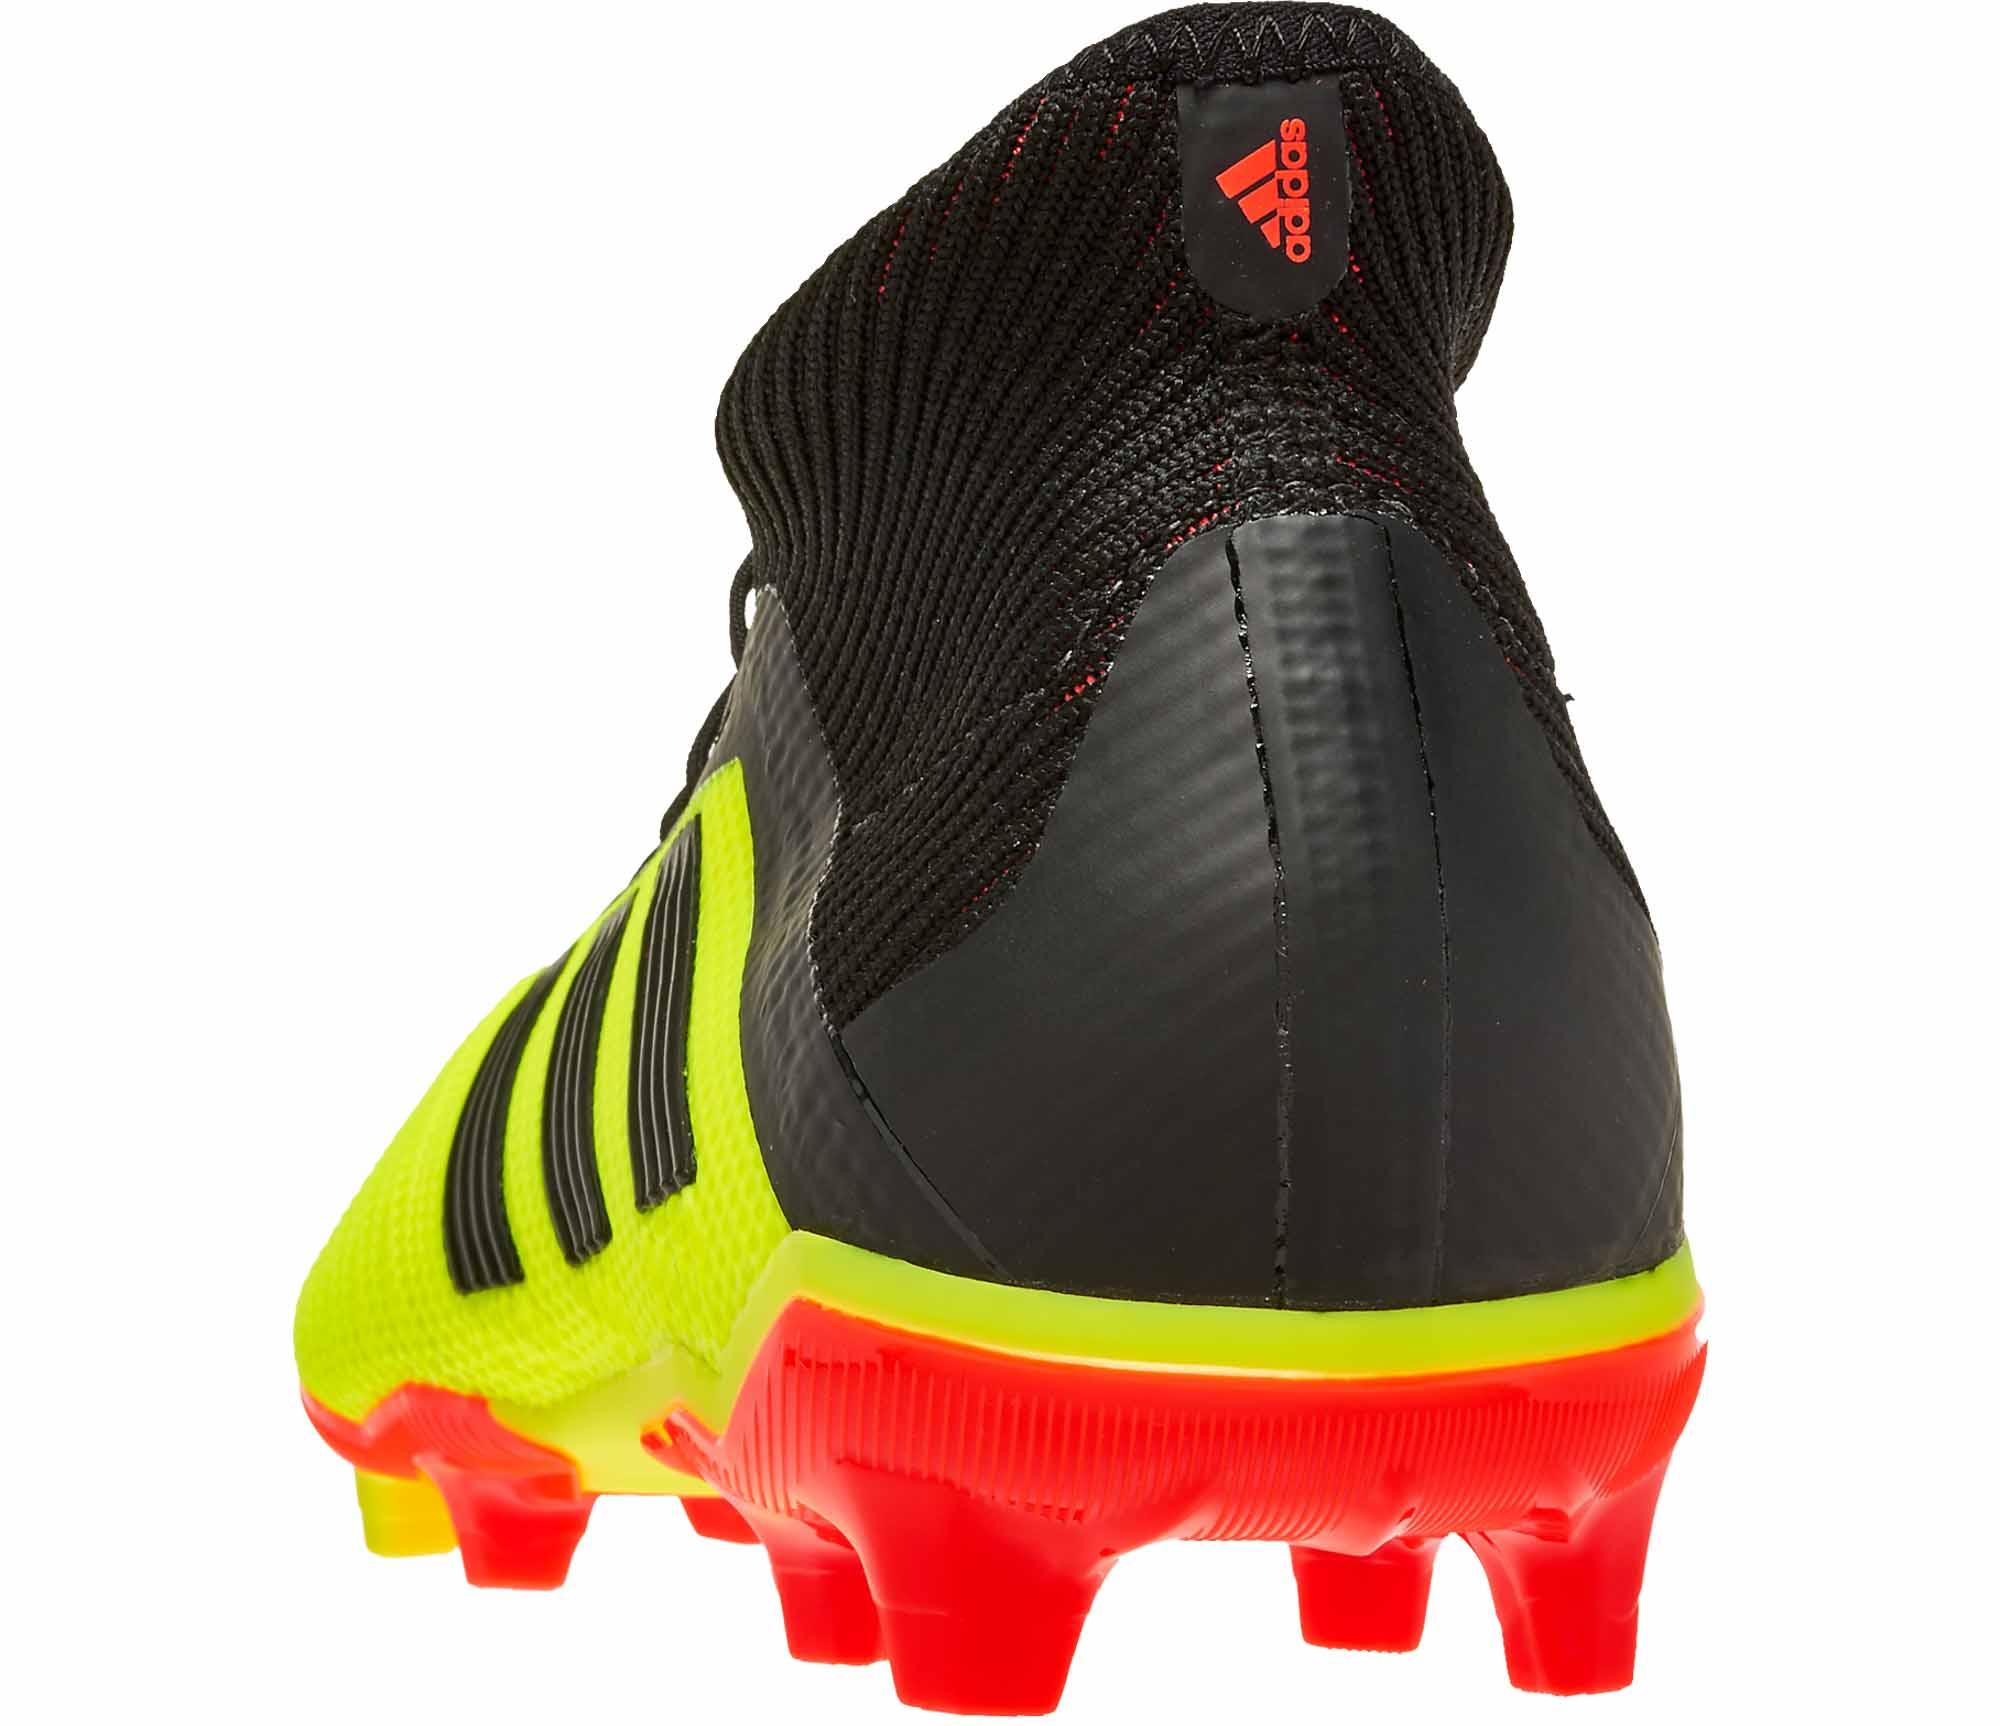 Kids adidas Predator 18.1 FG - Energy